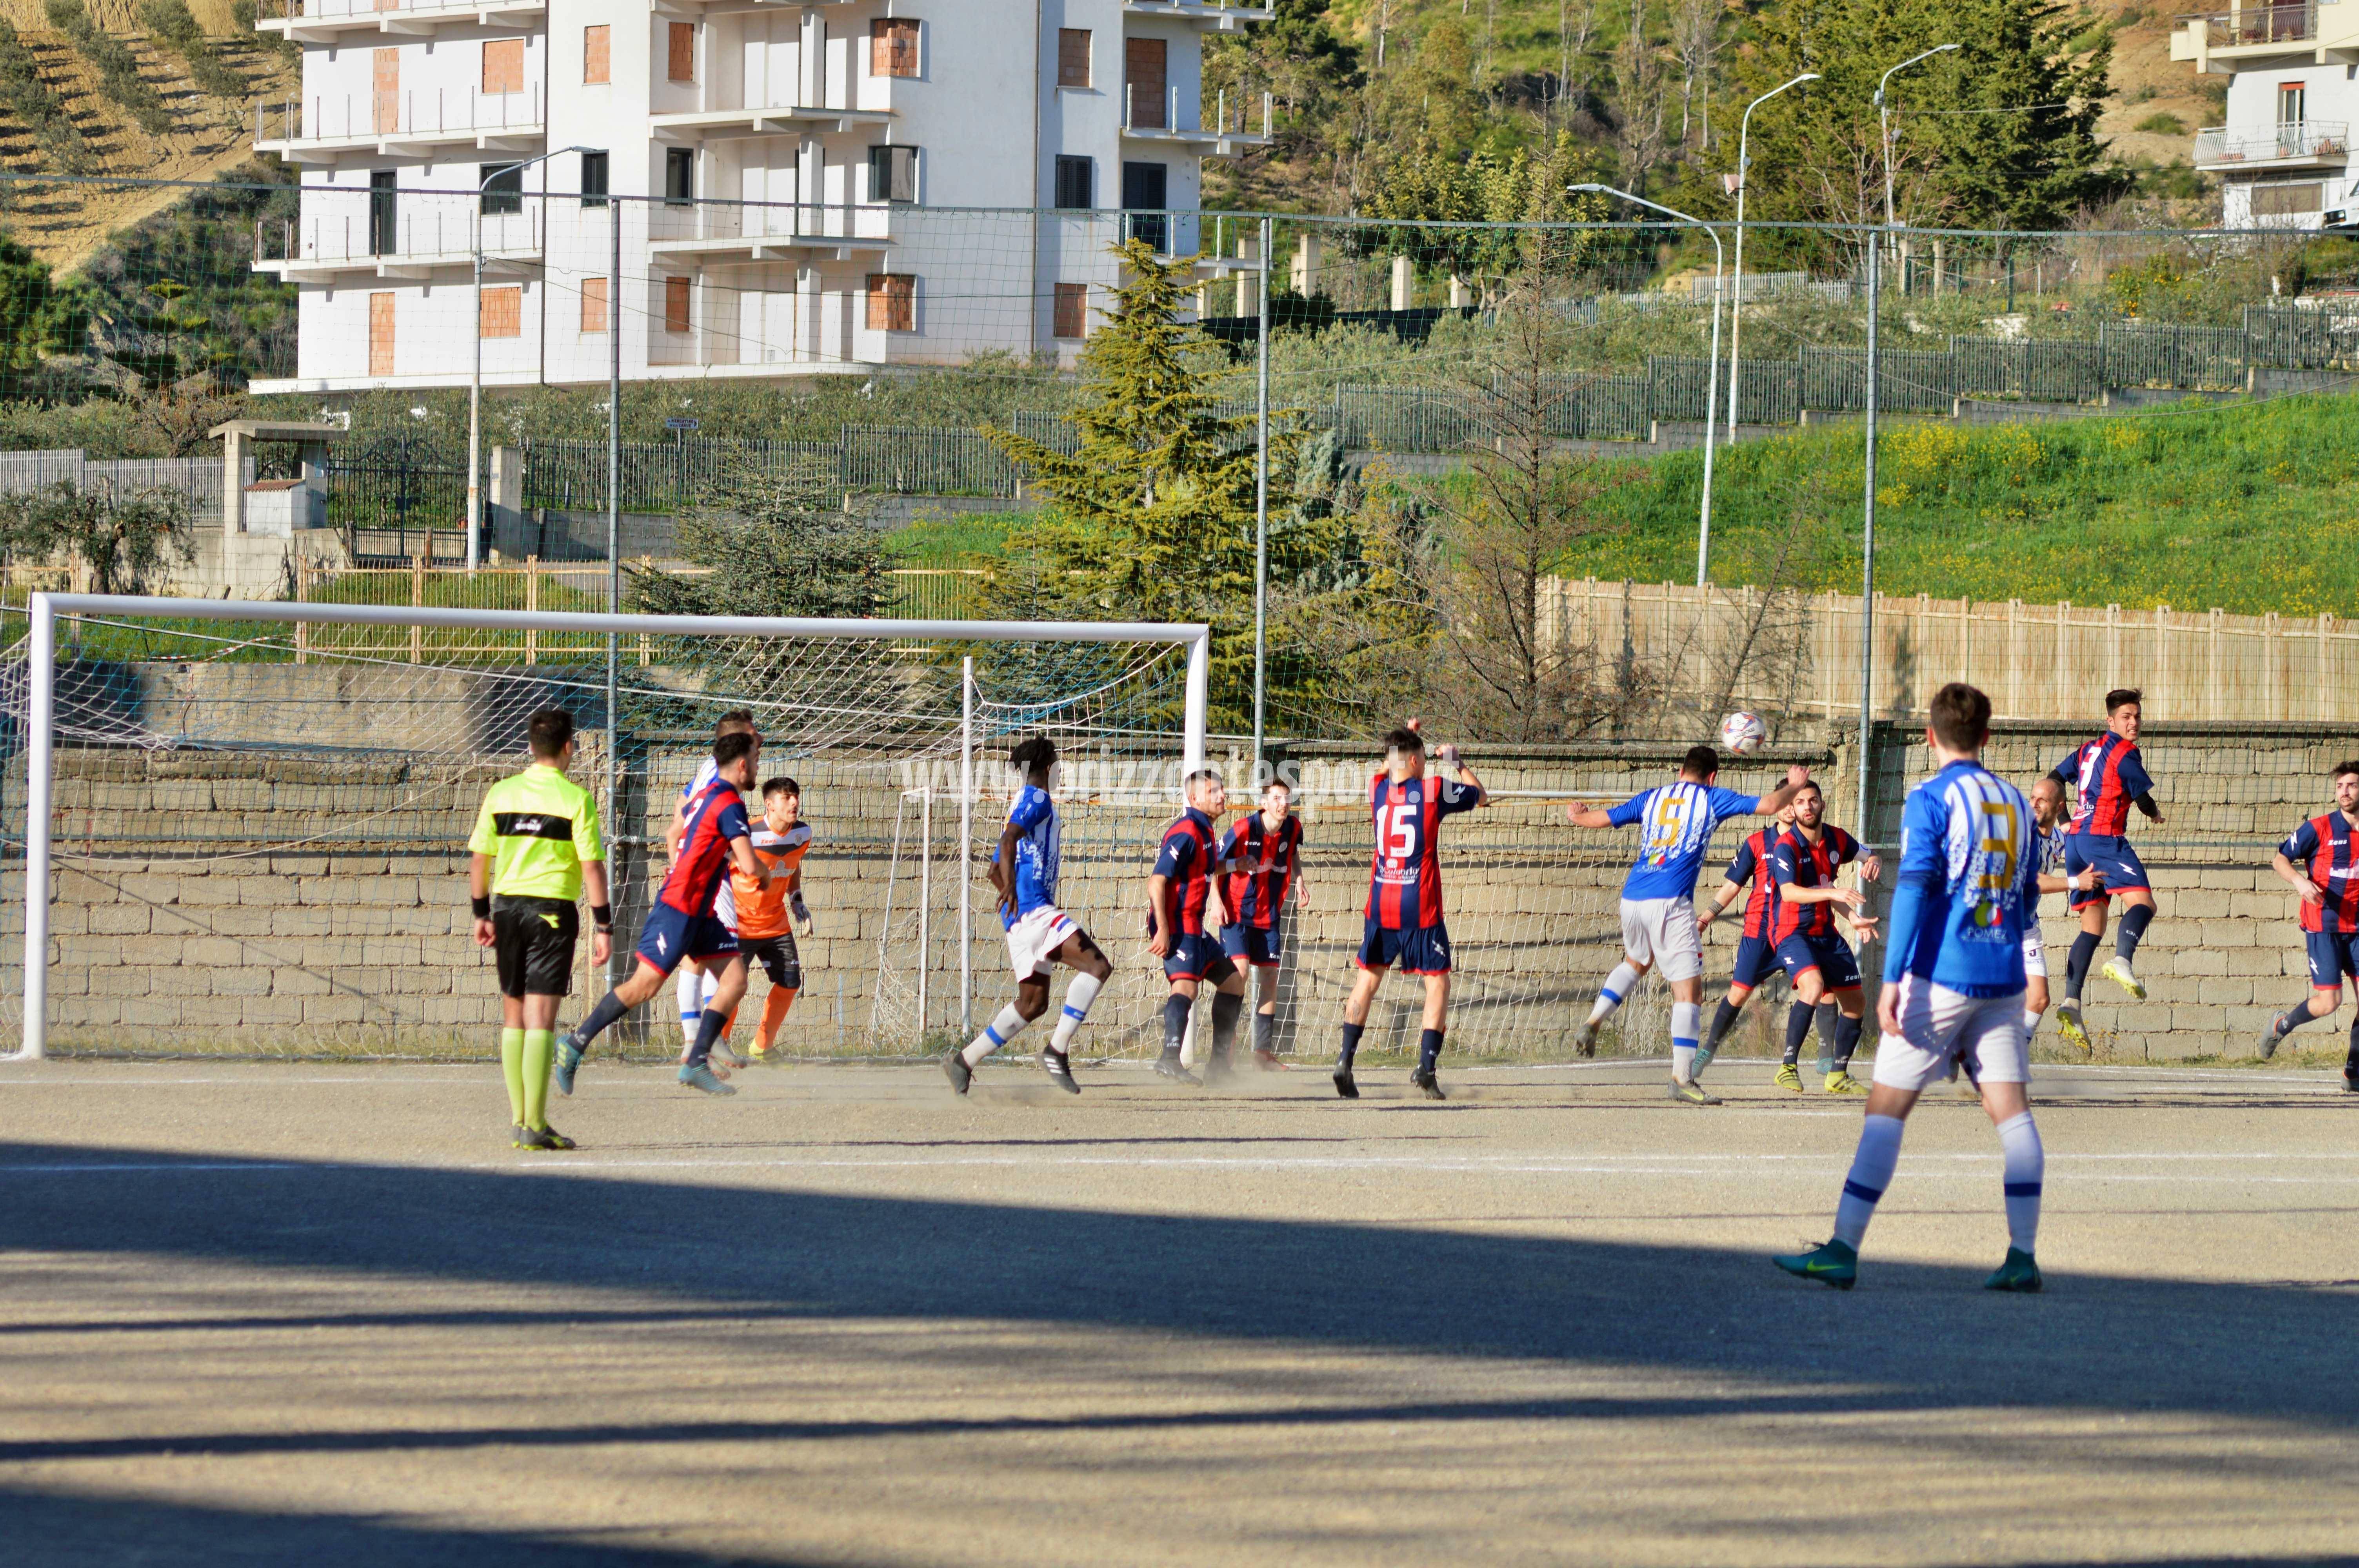 cassano_rossanese (131)